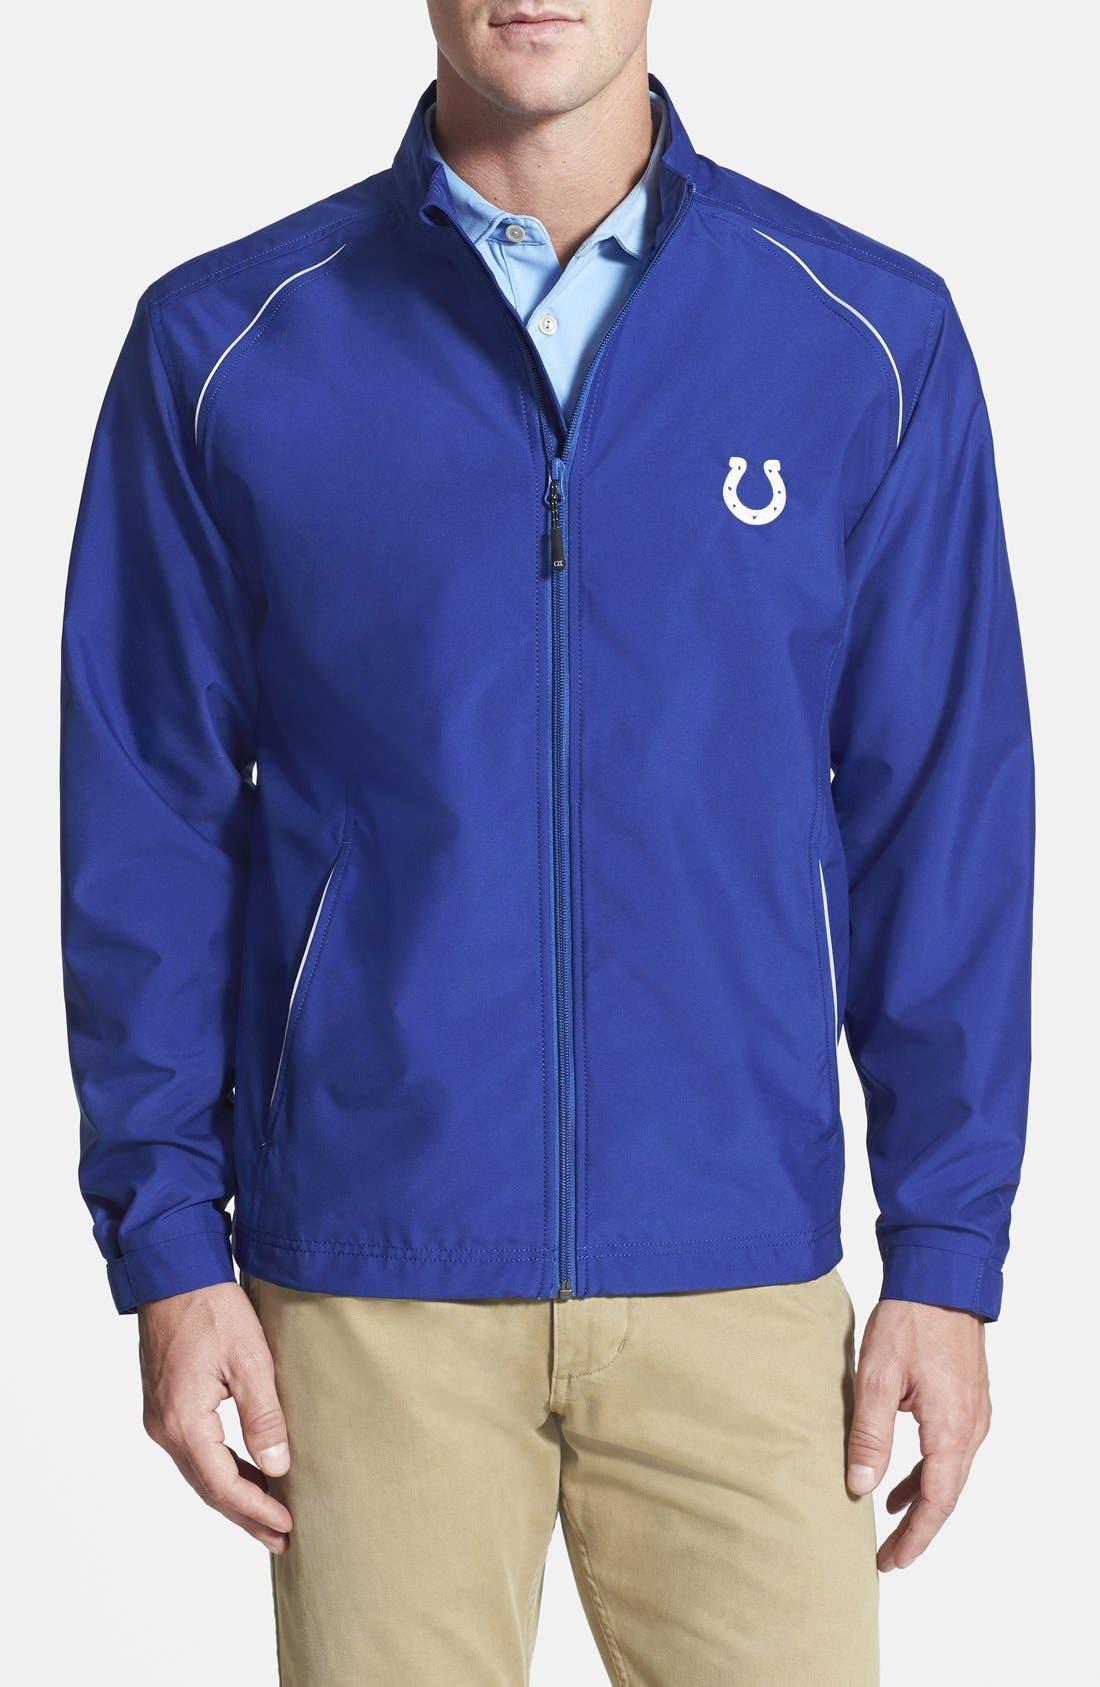 Indianapolis Colts - Beacon WeatherTec Wind & Water Resistant Jacket,                         Main,                         color, Tour Blue